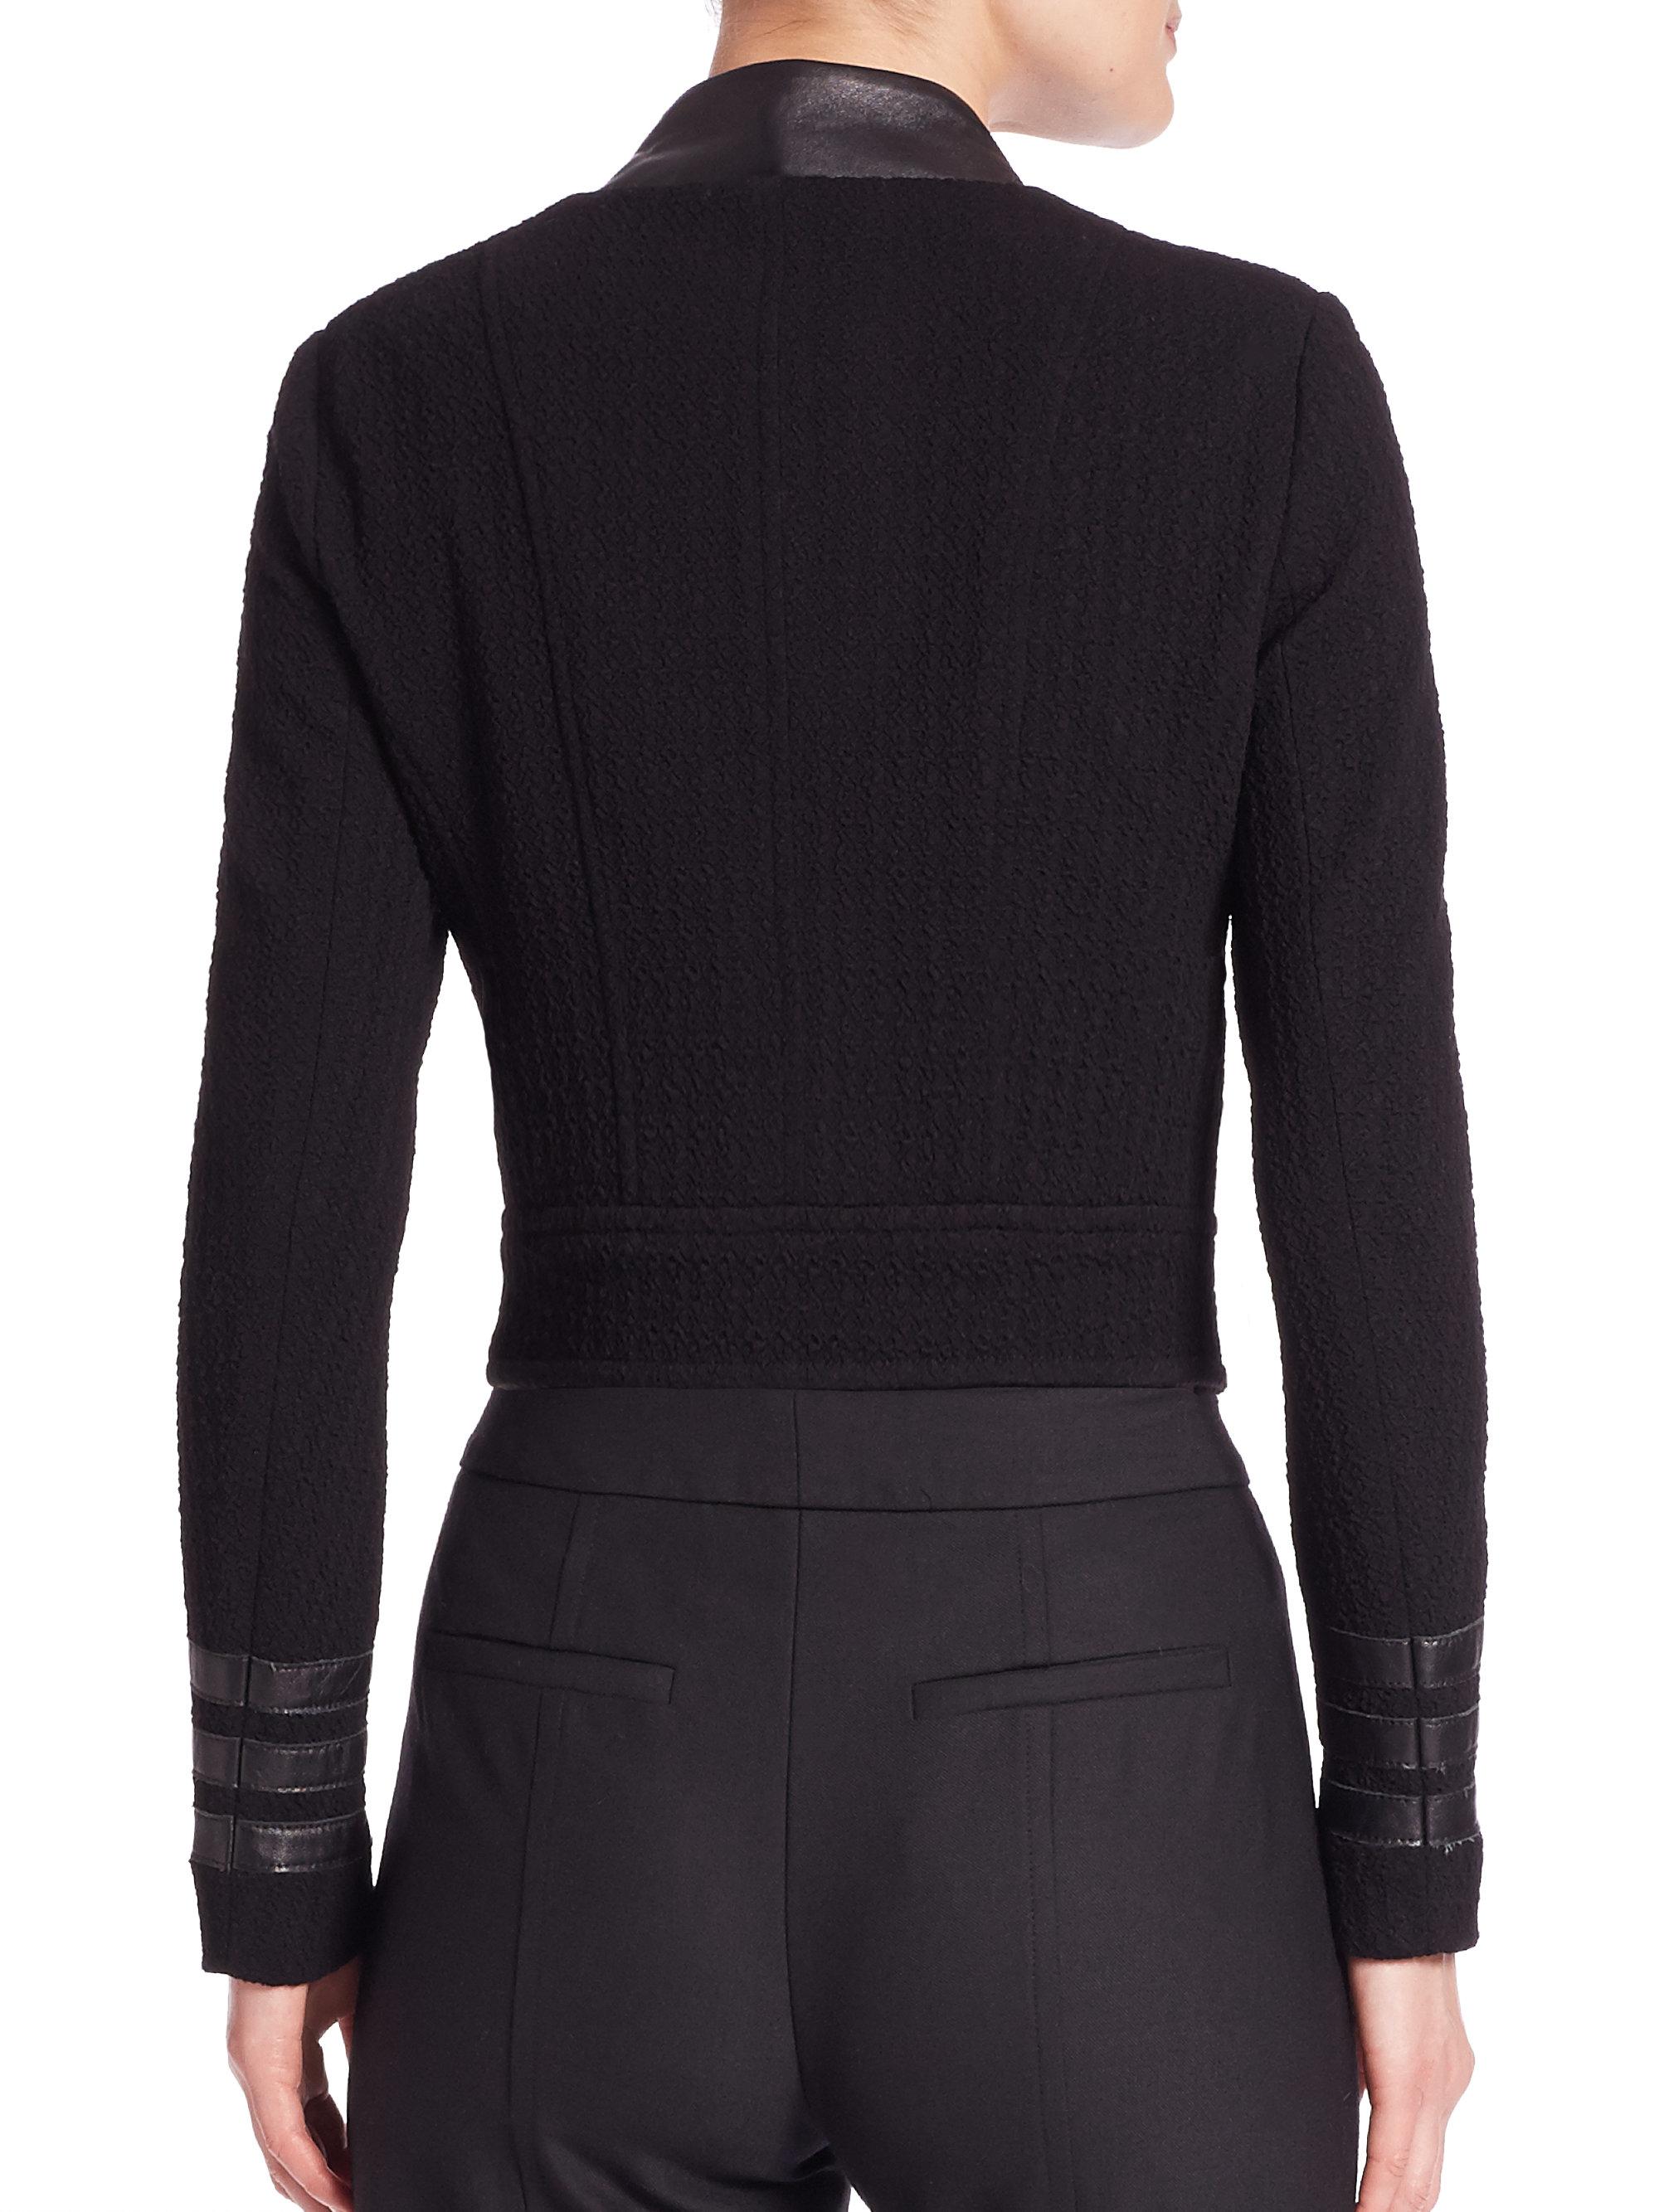 Nanette lepore leather jacket